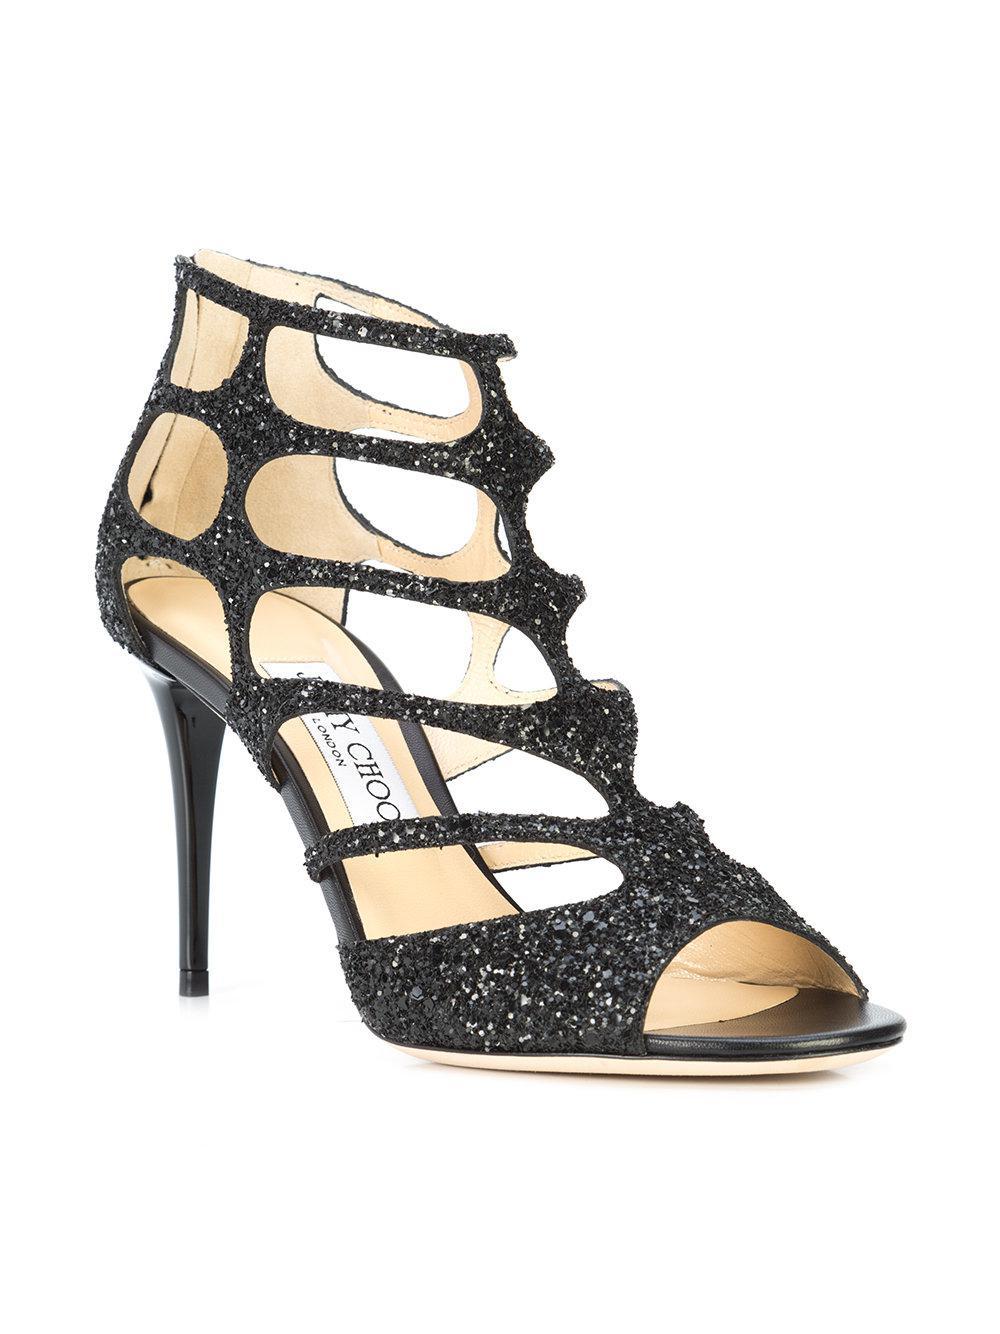 51bd2c94c23 Lyst - Jimmy Choo Ren 85 Sandals in Black